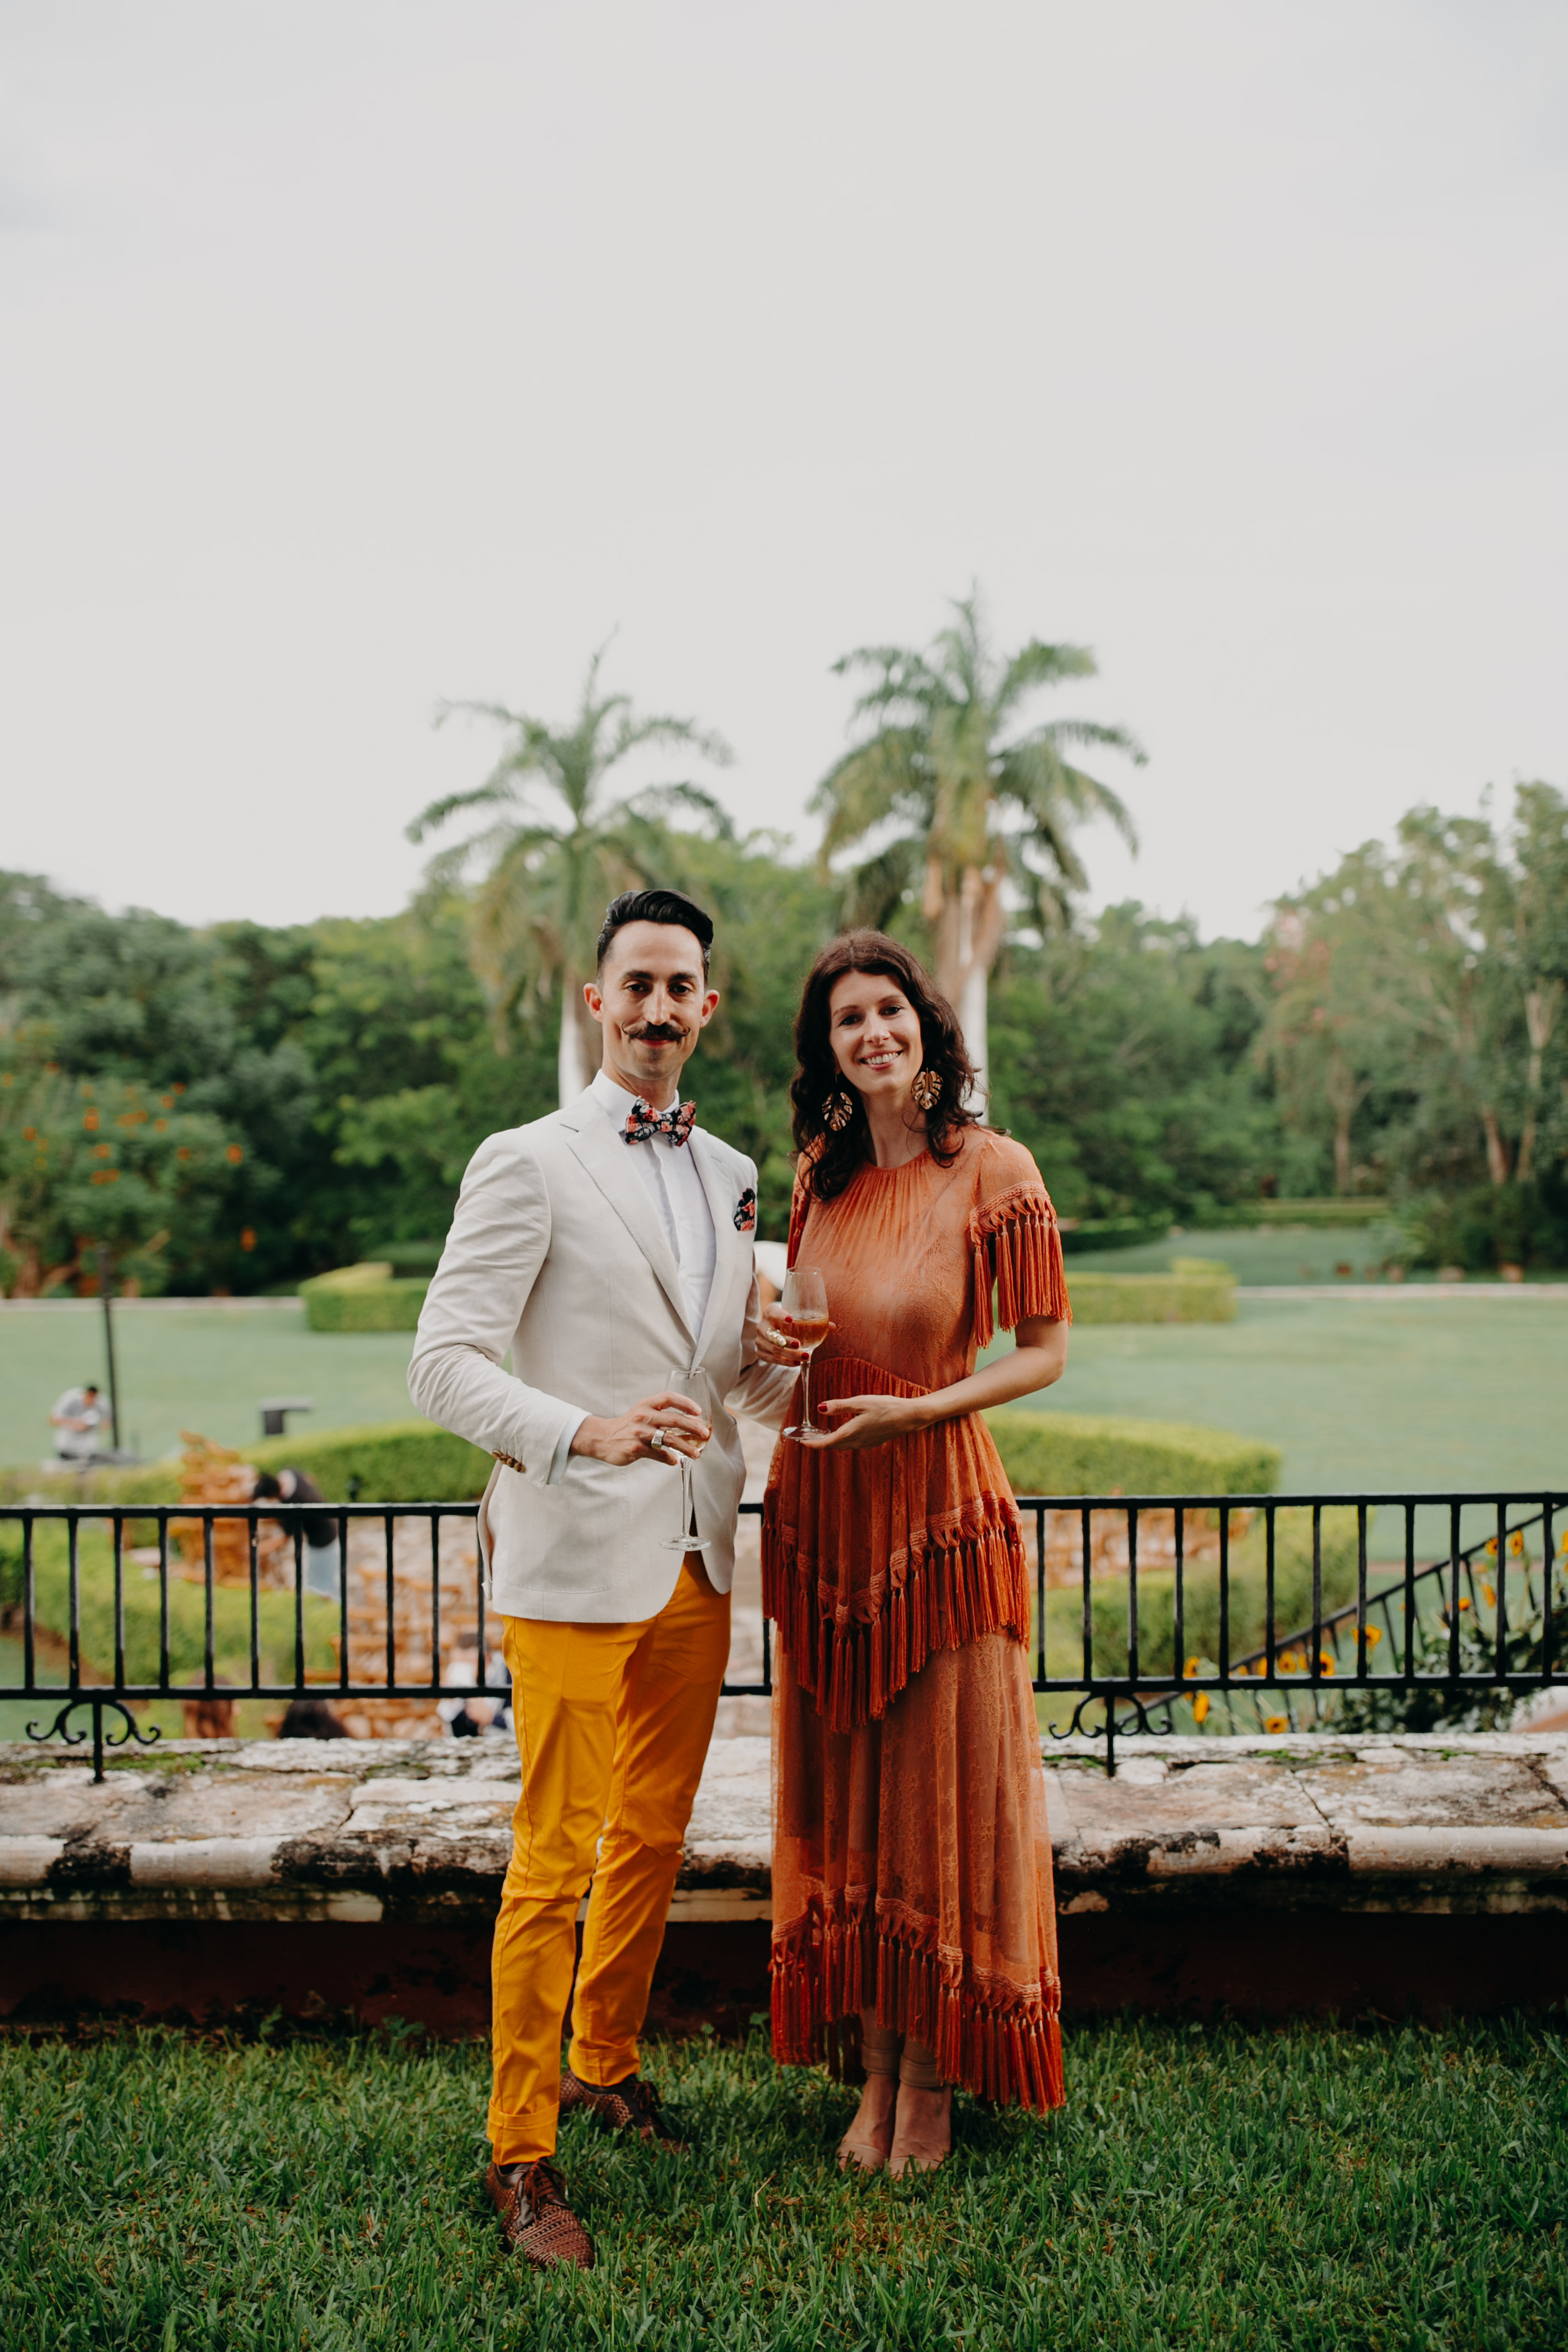 Hacienda Temozon Yucatan Mexico Wedding | Ida & Peter Emily Magers Photography-1248.jpg